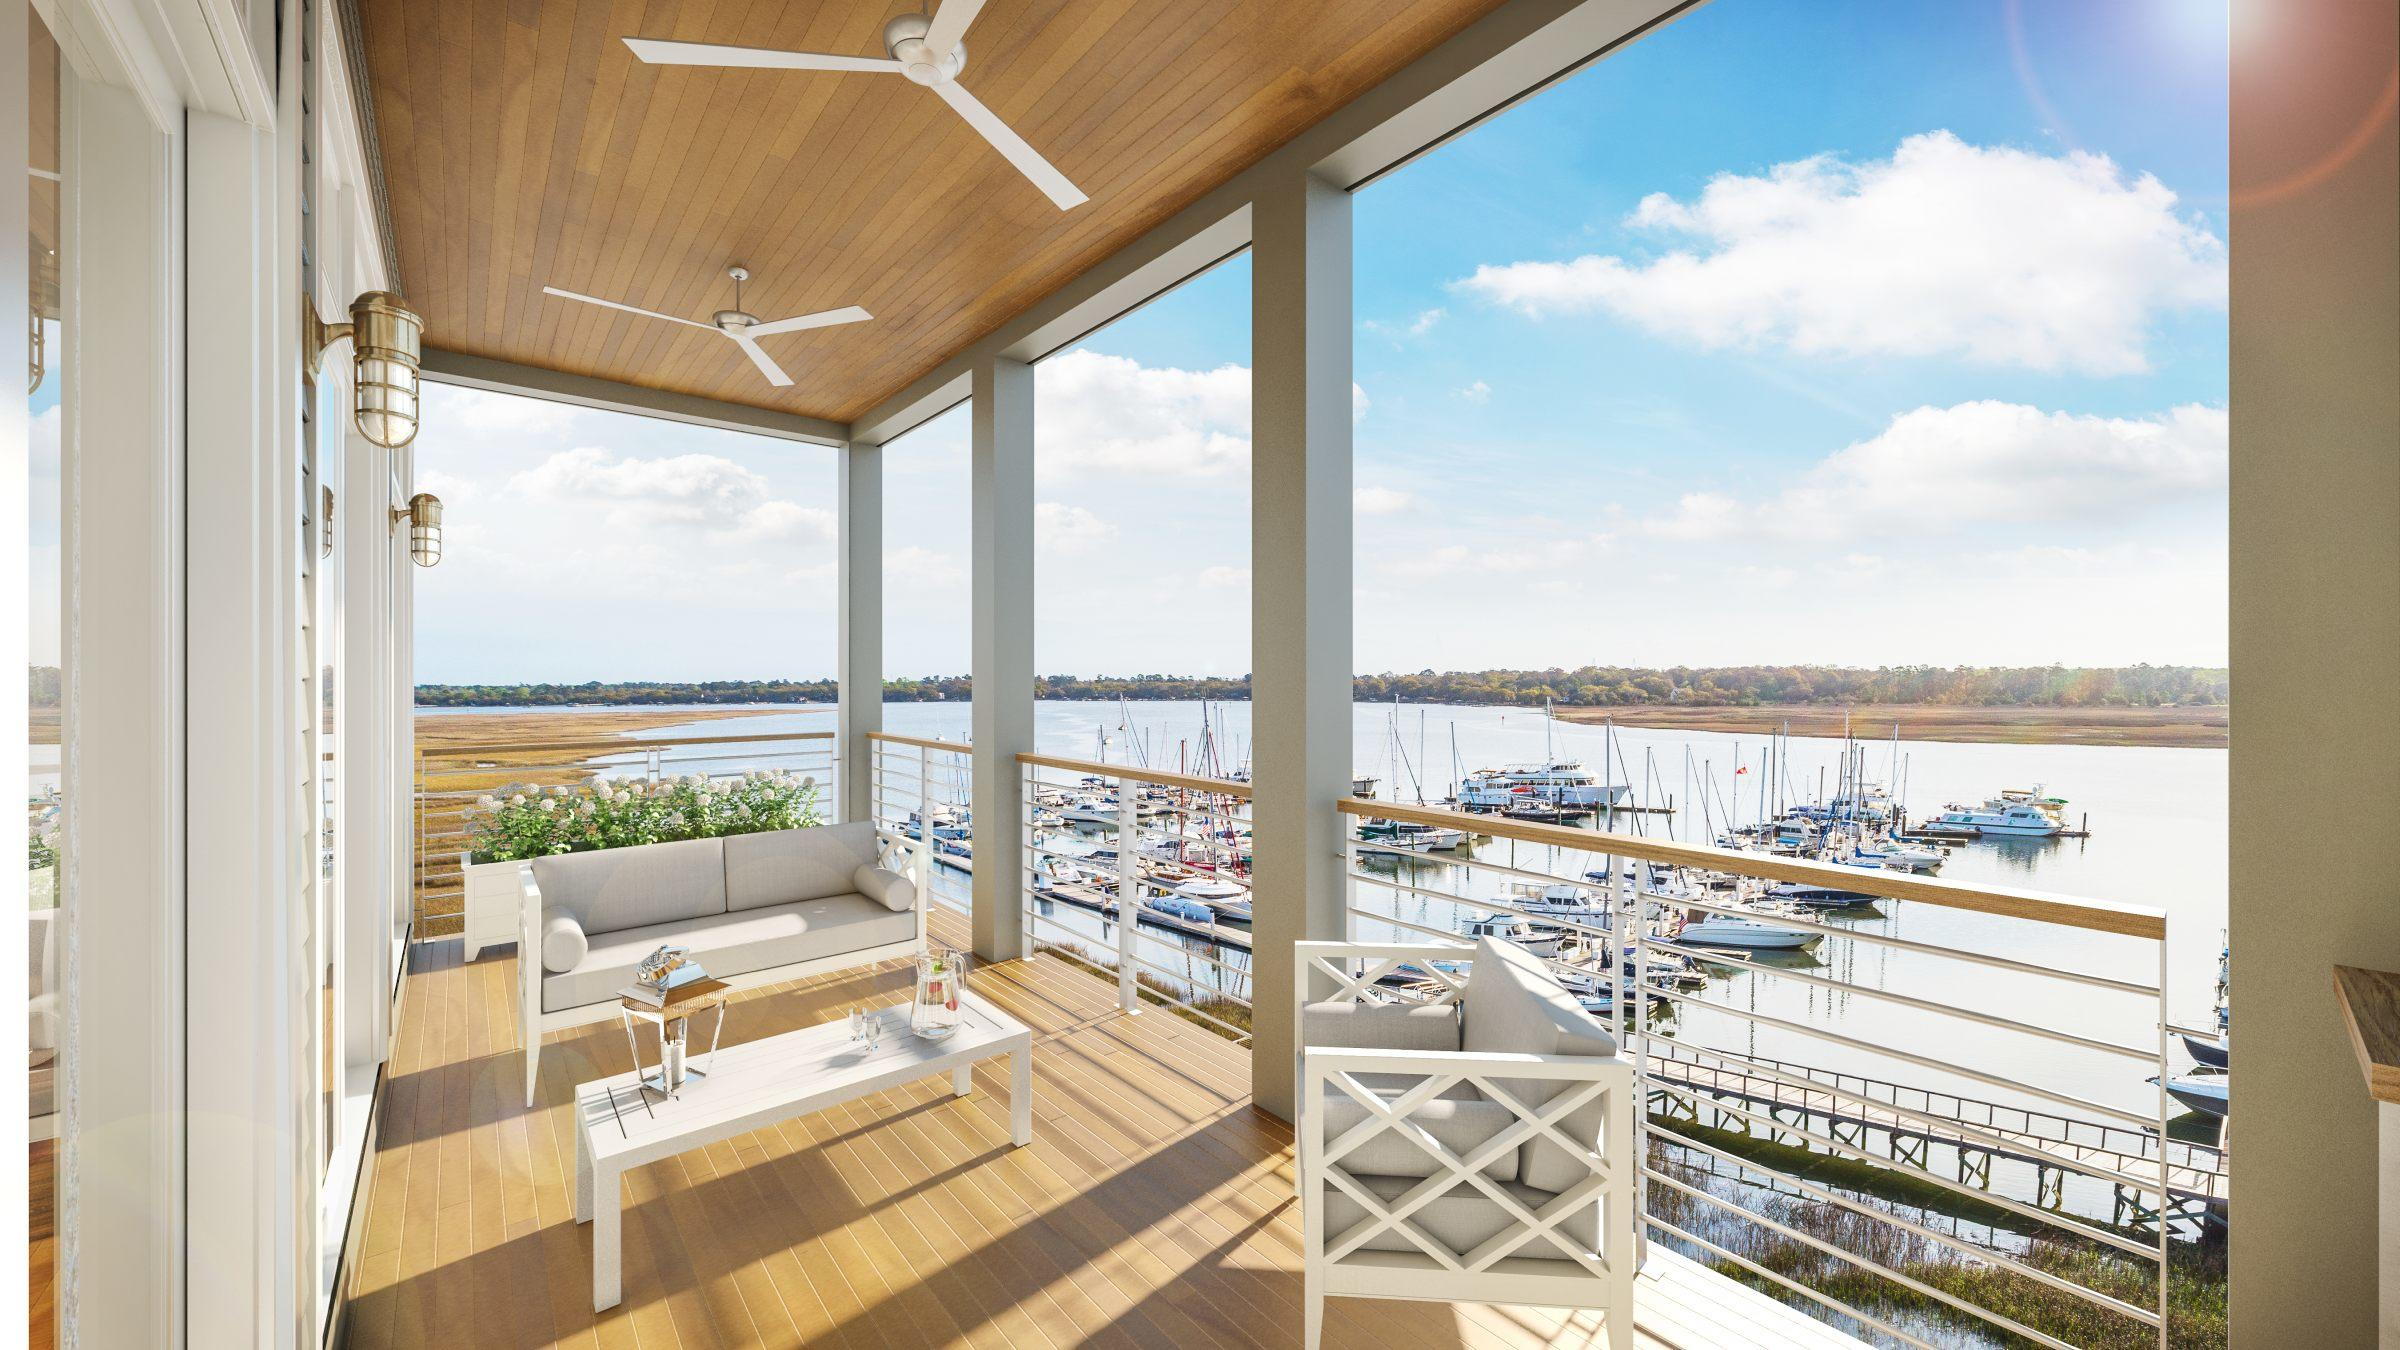 St. Johns Yacht Harbor Condos For Sale - 2408 Maybank, Johns Island, SC - 2